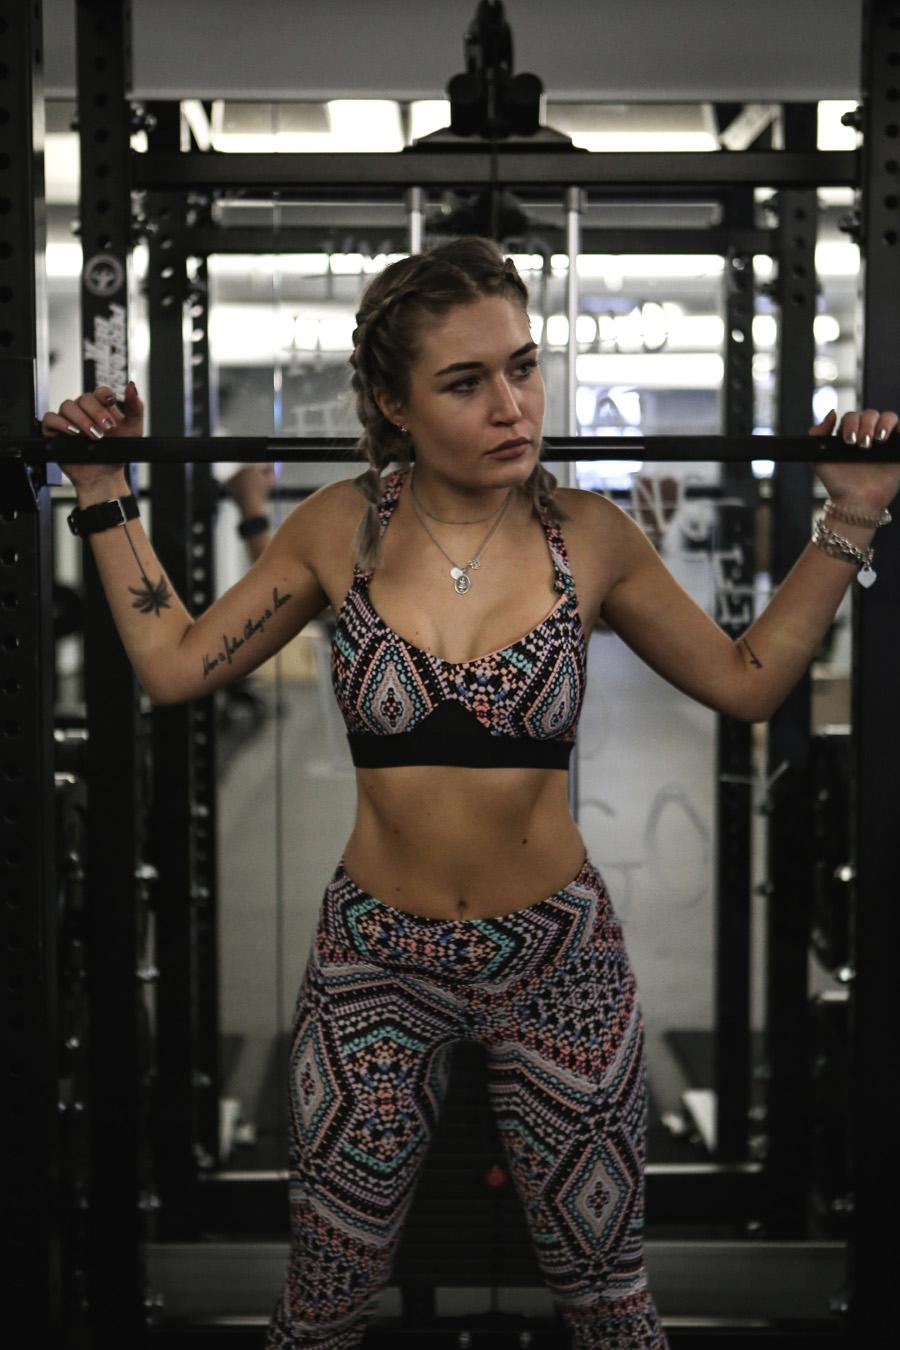 lauralamode-fitness-sport-gym-fitnessstudio-seafolly-adidas-boxkitchen-munich-home workout-muenchen